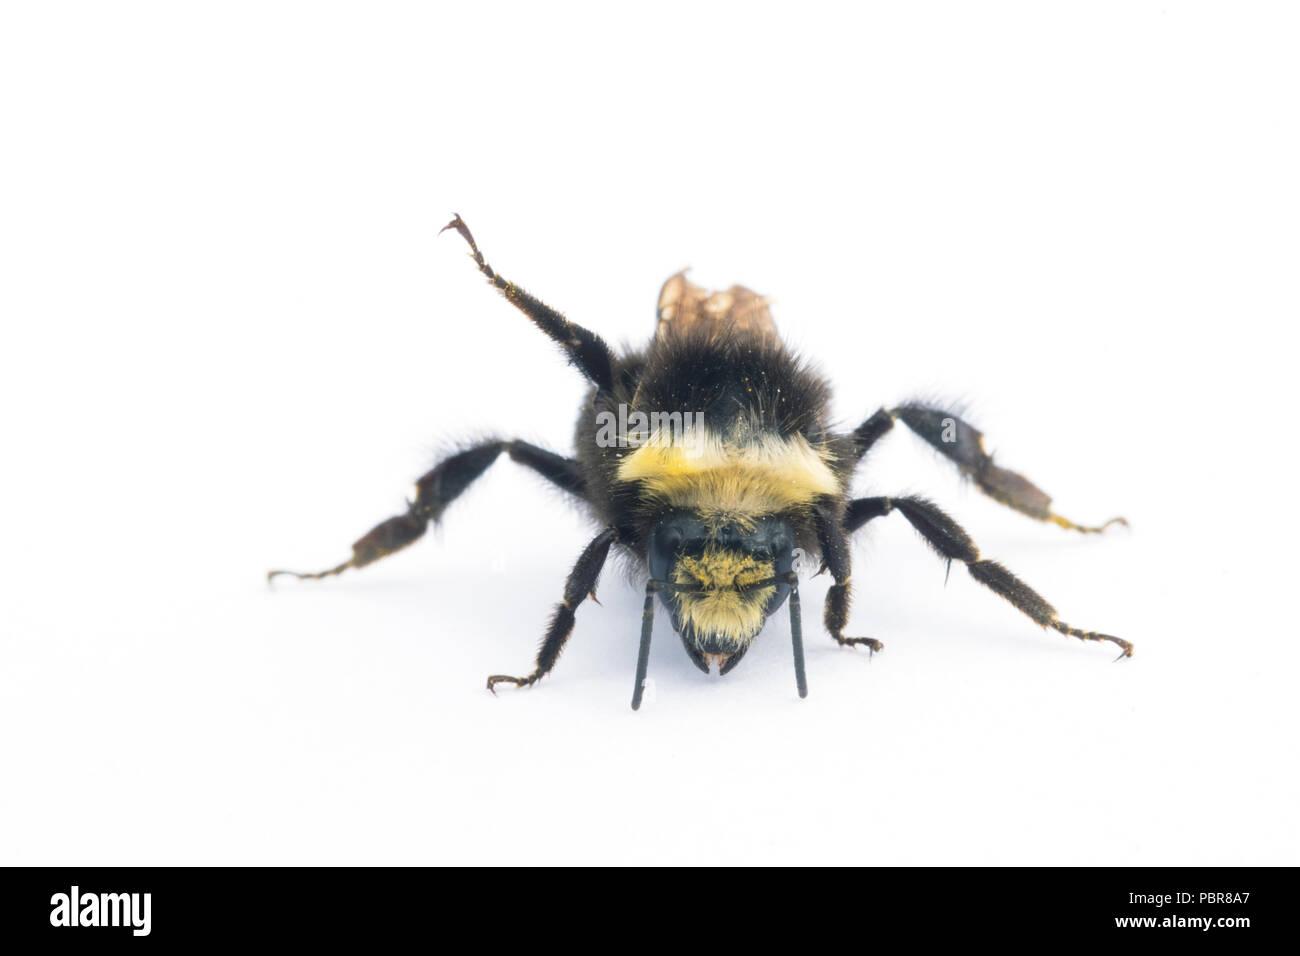 Yellow-faced Bumblebee (Bombus vosnesenskii)  Common bumble bee of Northwestern US, close-up portrait - Stock Image